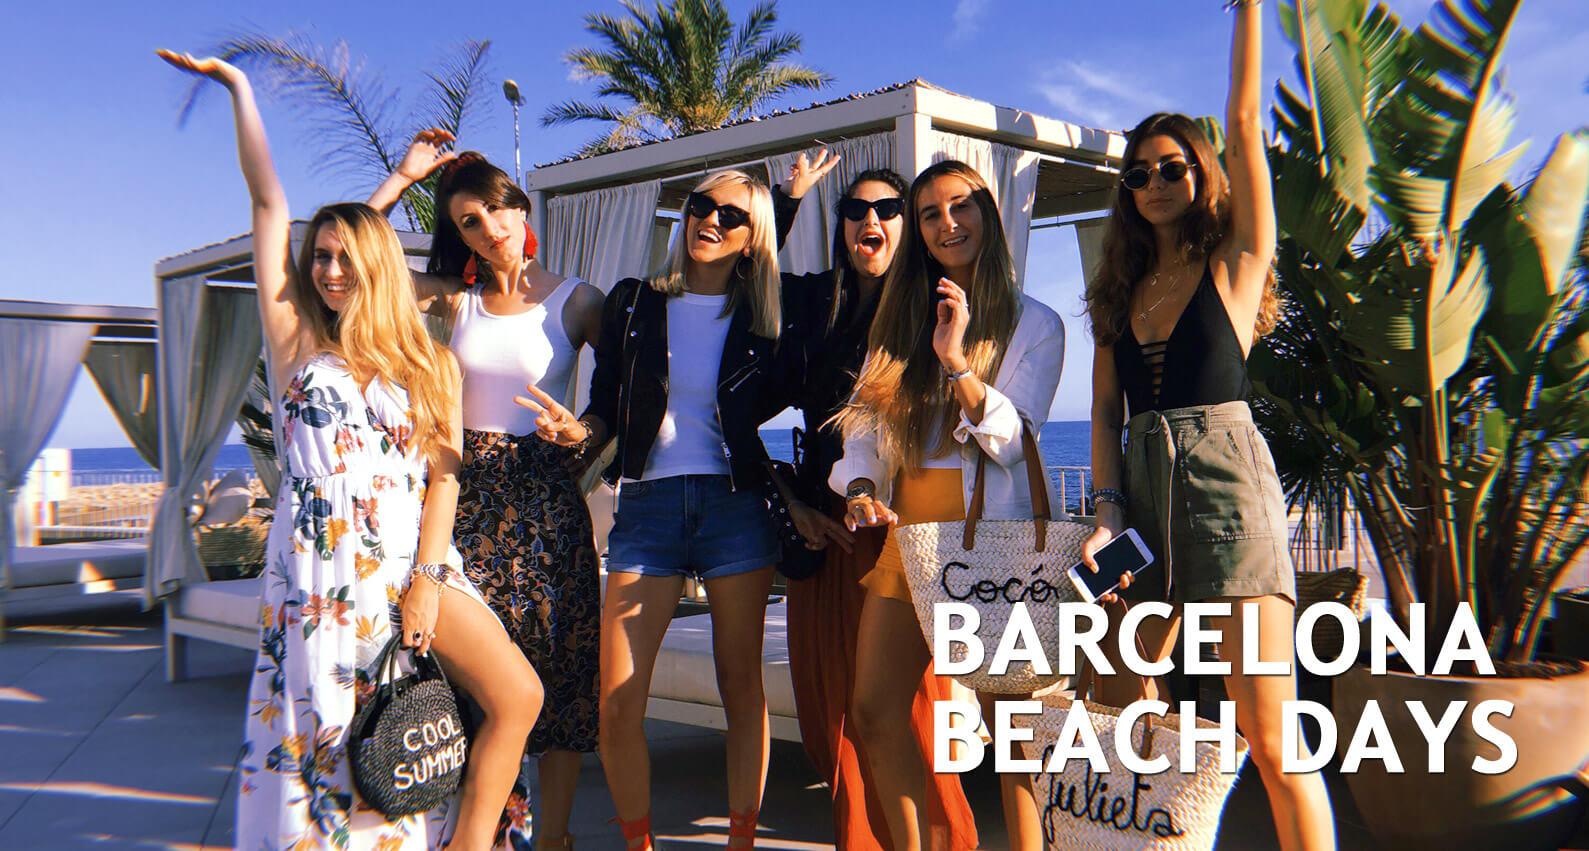 Barcelona beach days